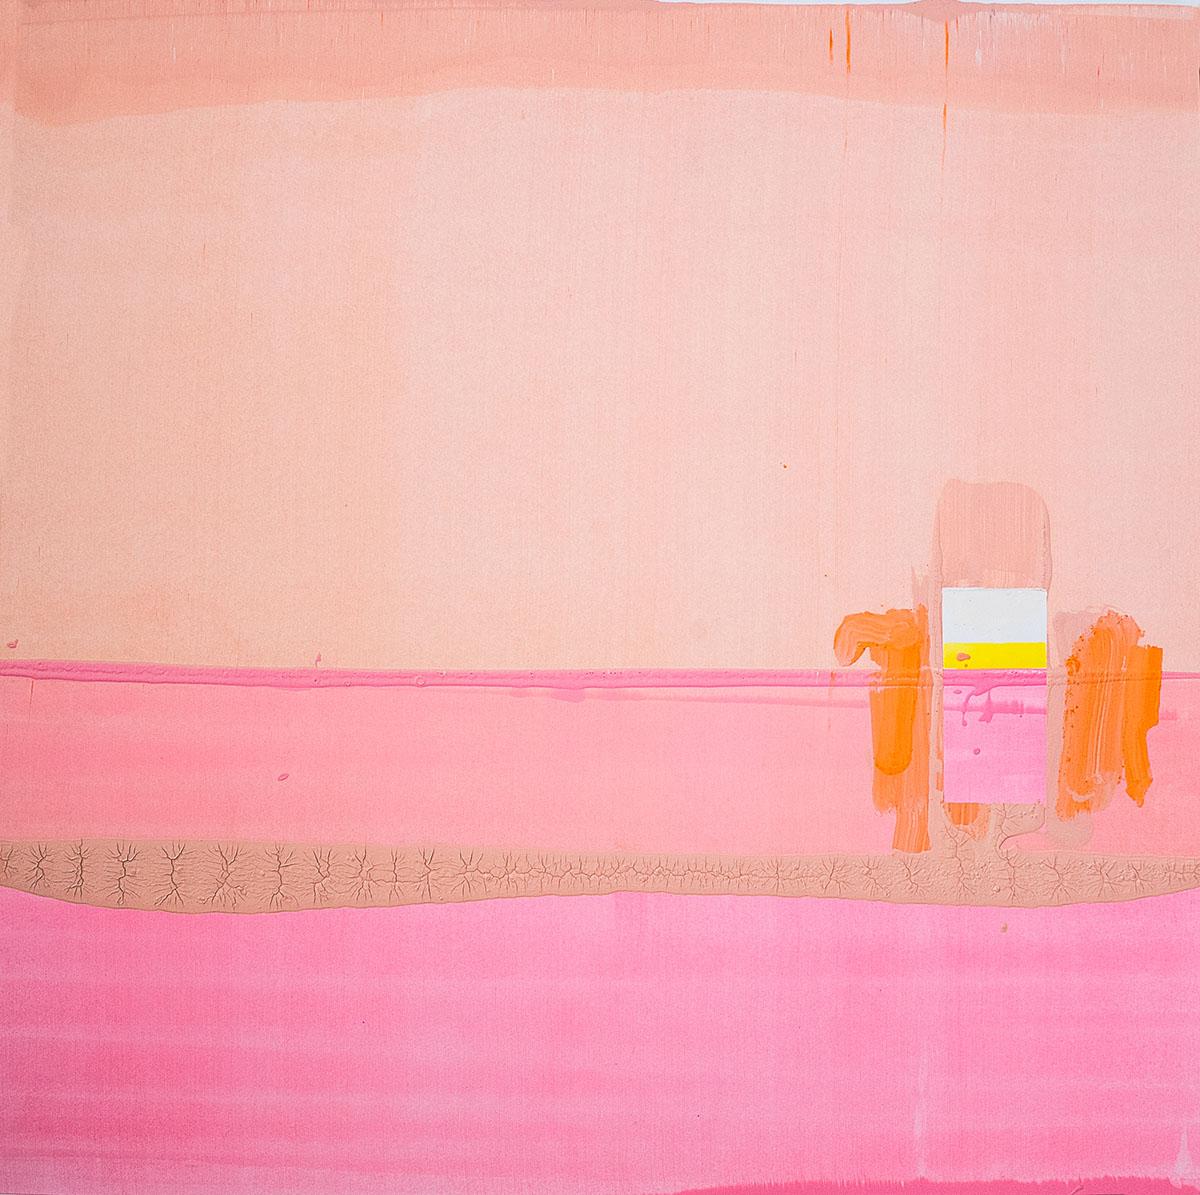 Lena Knilli I Am Still Looking For The Door (pink 1), 2019 Aquarell, Akryl und Eitempera auf Papier 70 x 70 cm Foto: F Alpagu